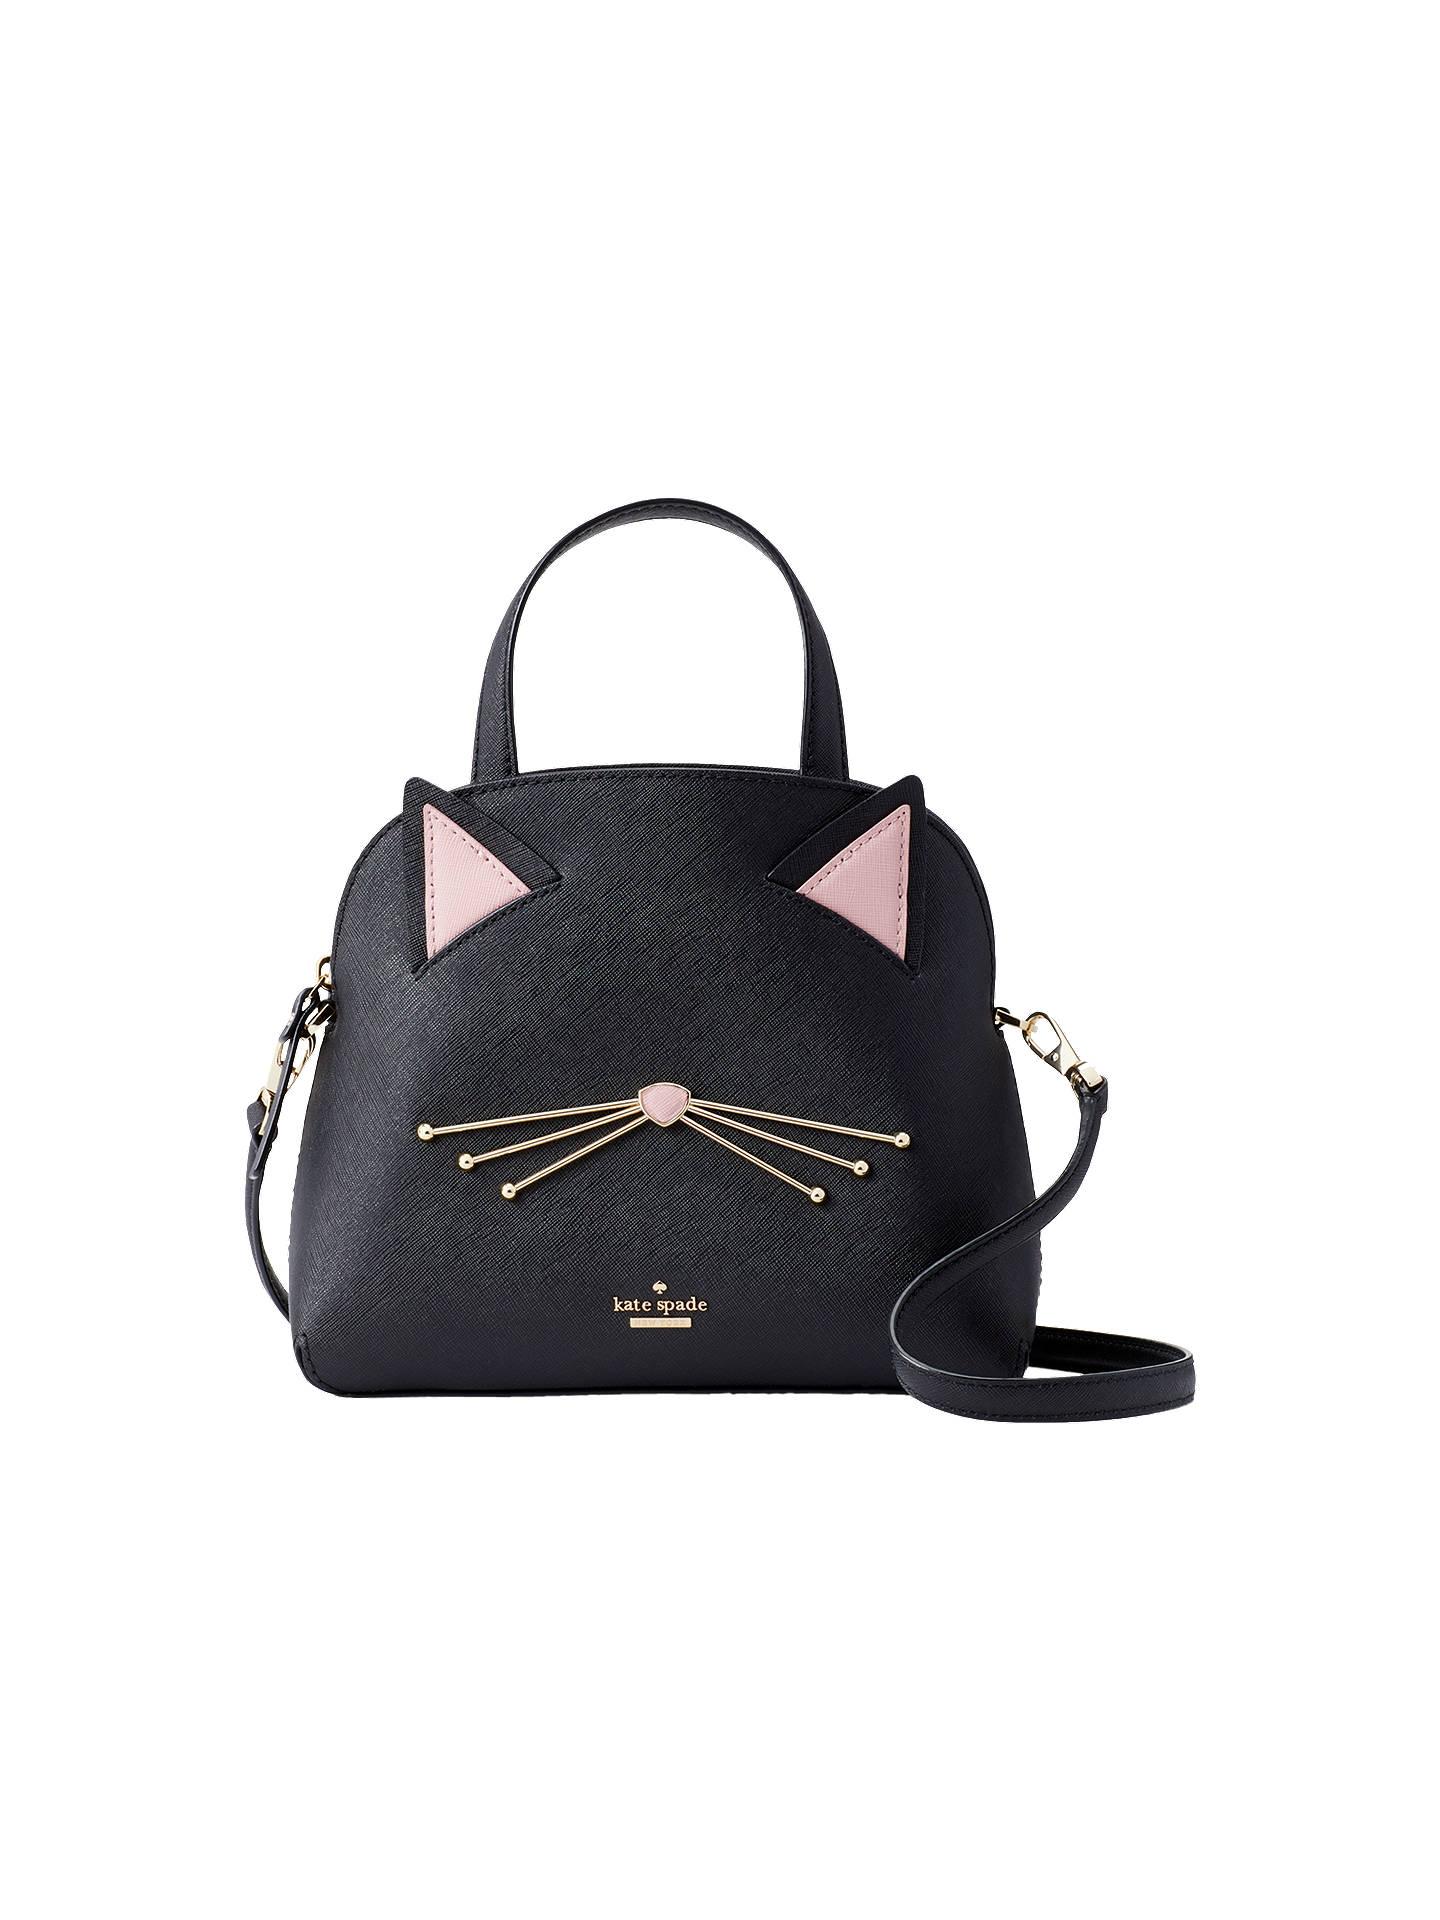 a8aaa4d8c9b6 Buy kate spade new york Cat's Meow Lottie Leather Grab Bag, Black Online at  johnlewis ...